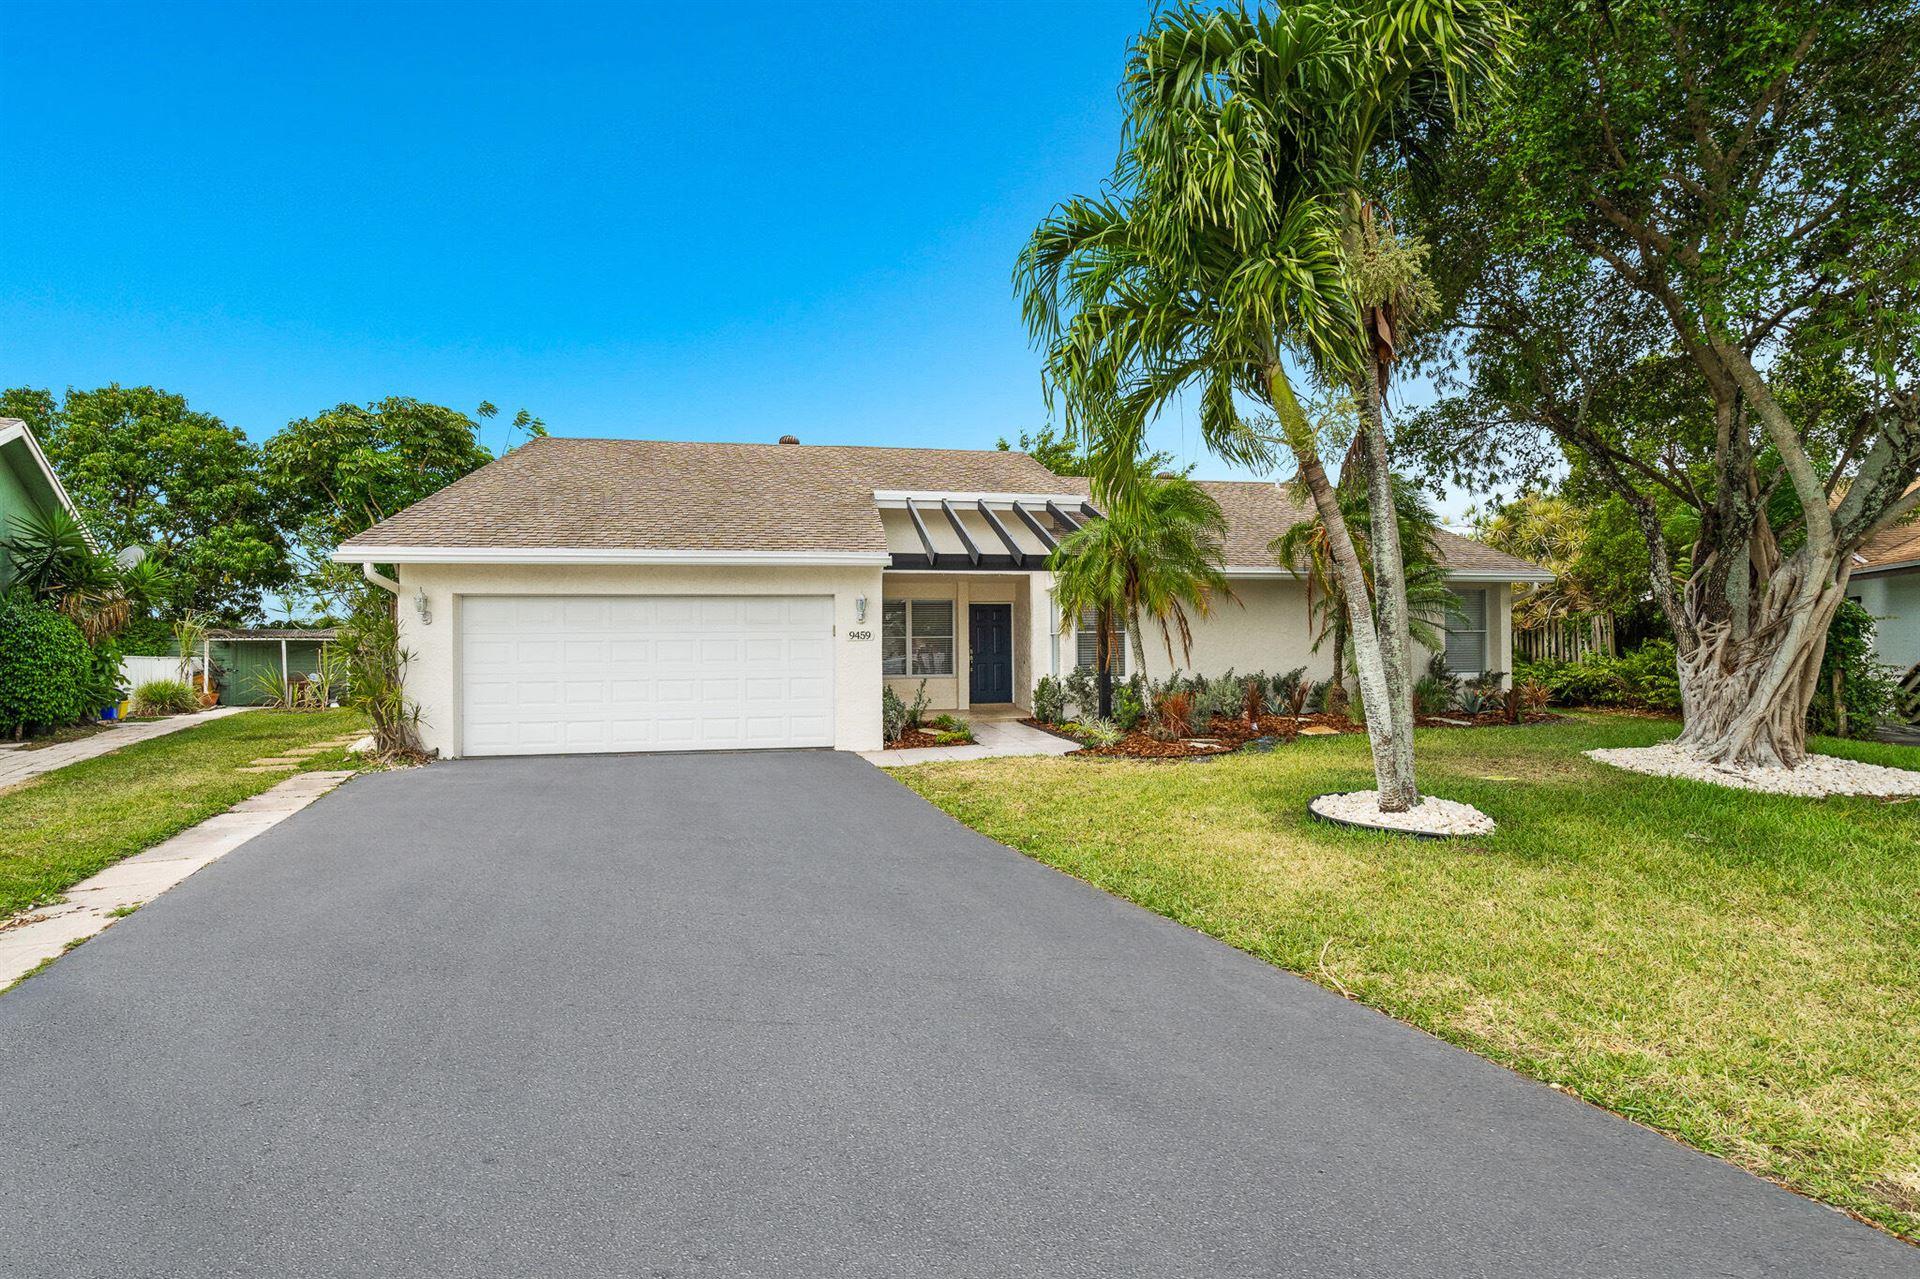 9459 Burlington Place, Boca Raton, FL 33434 - MLS#: RX-10710080